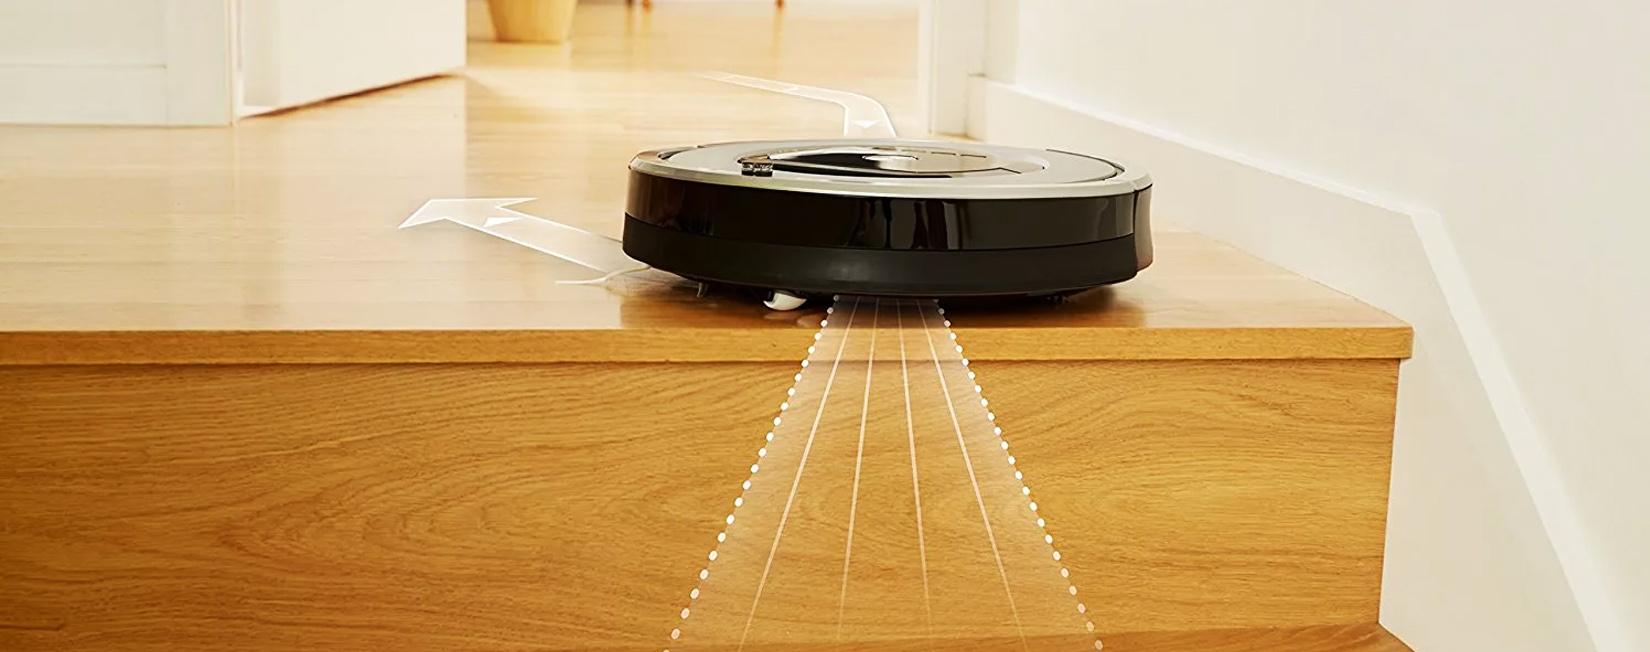 iRobot Roomba 676 не падает со ступеней